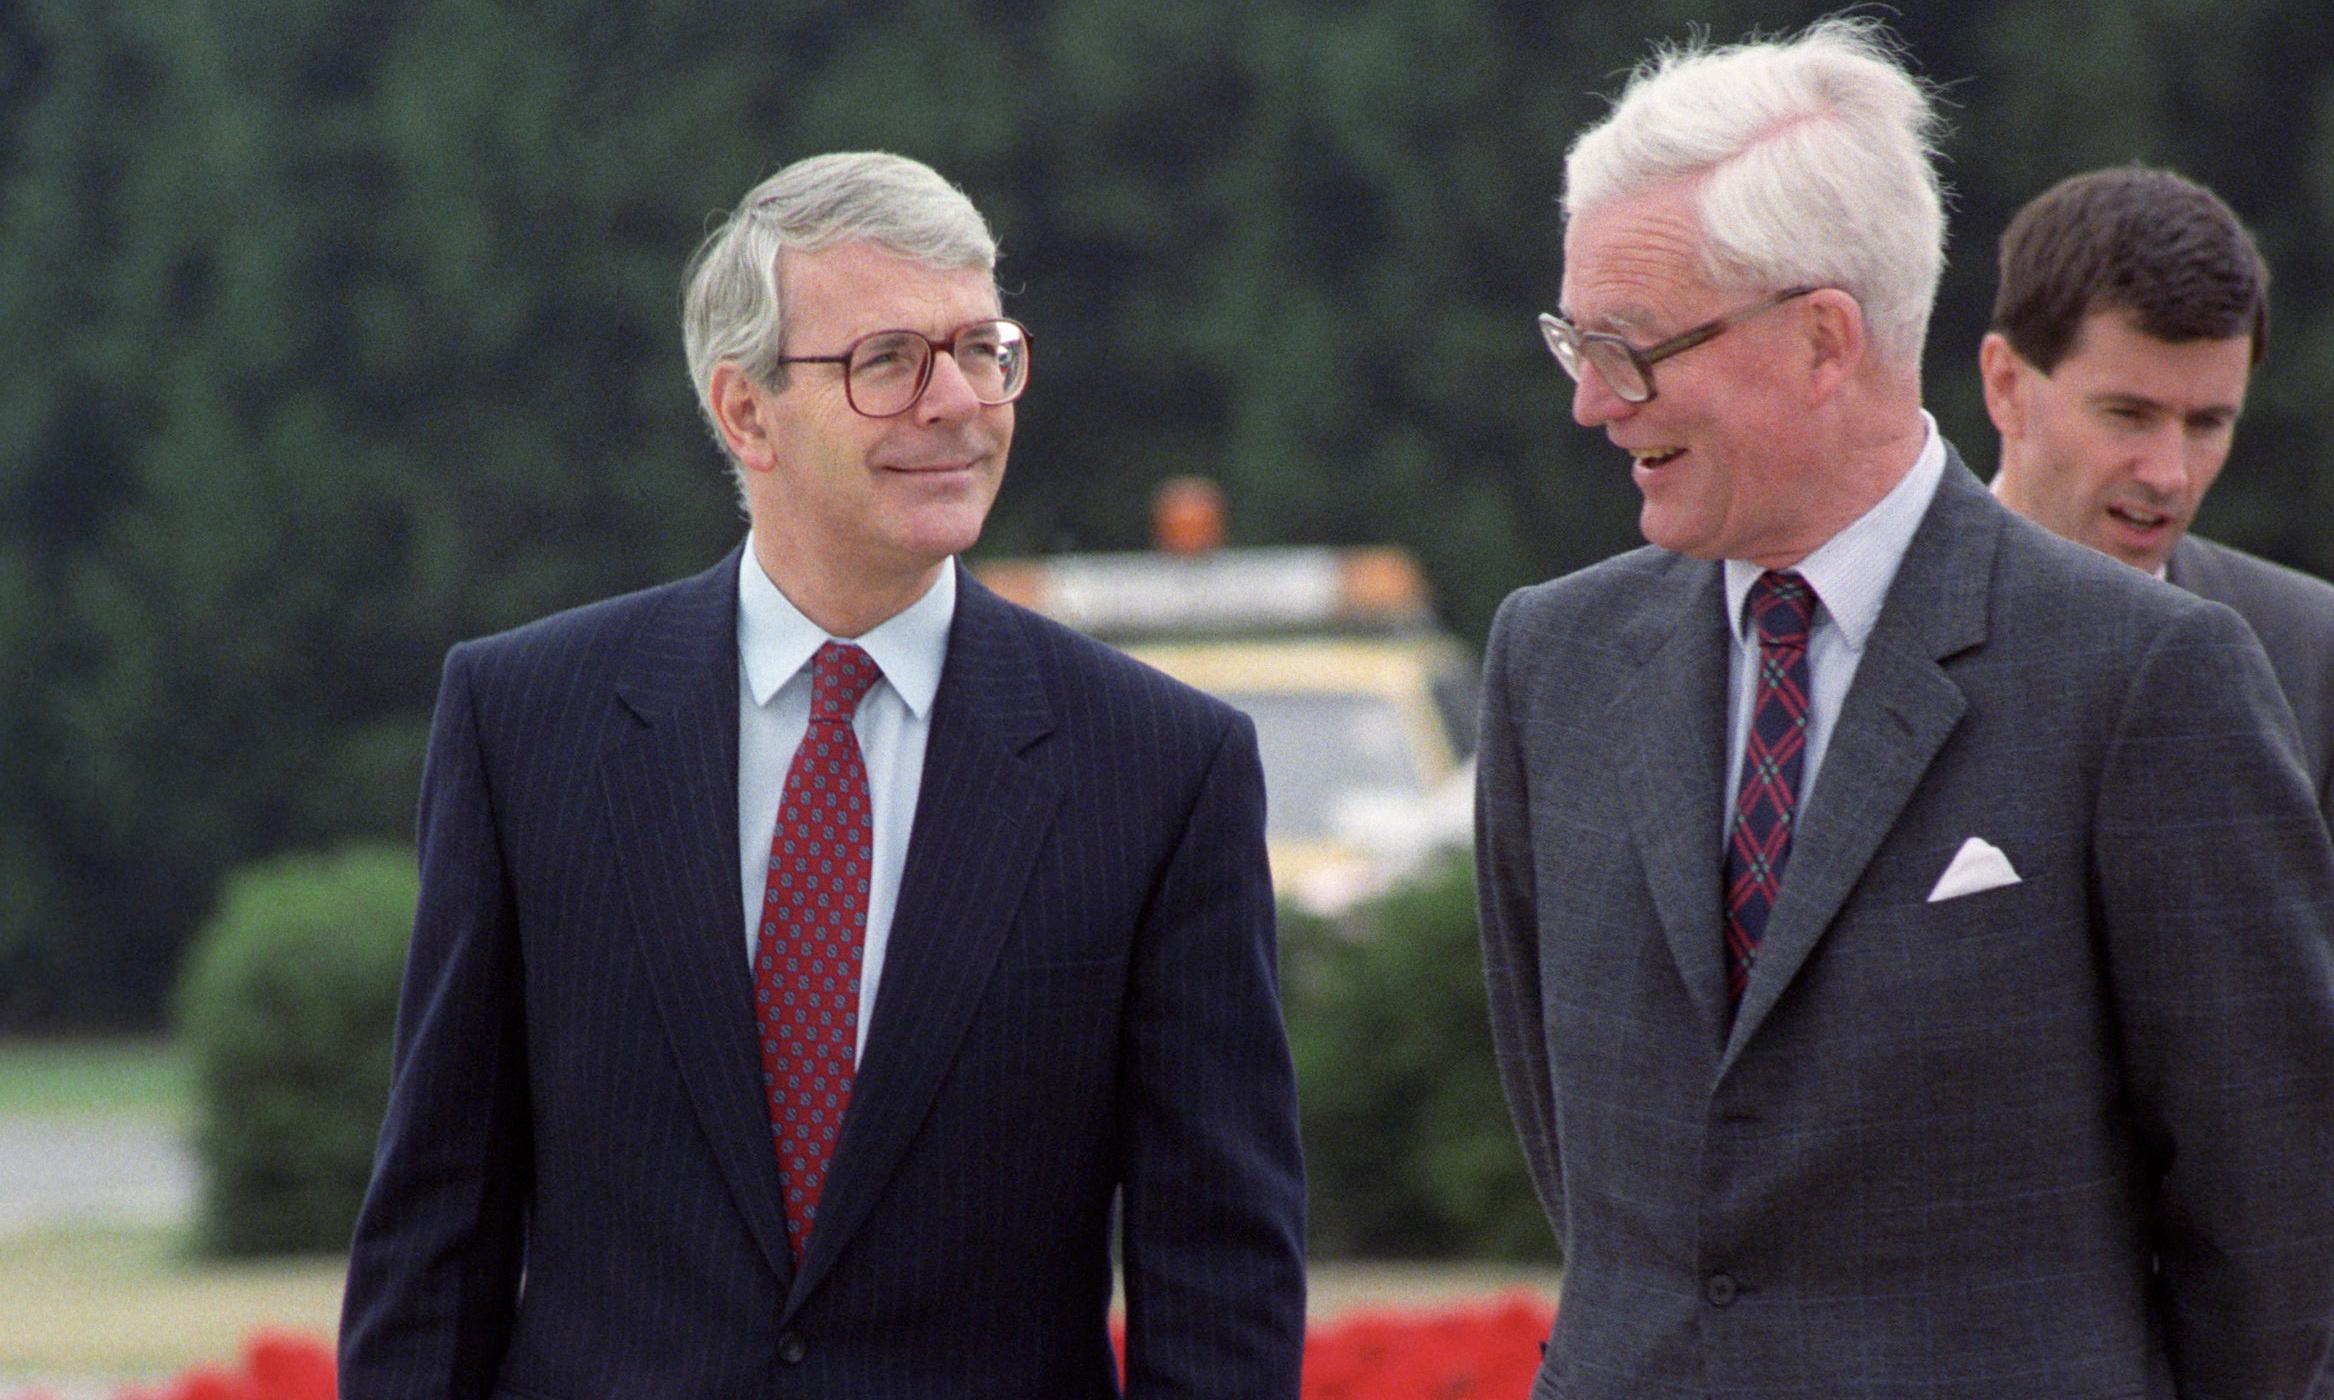 Douglas Hurd warned Major of dangers of UK isolation, papers reveal